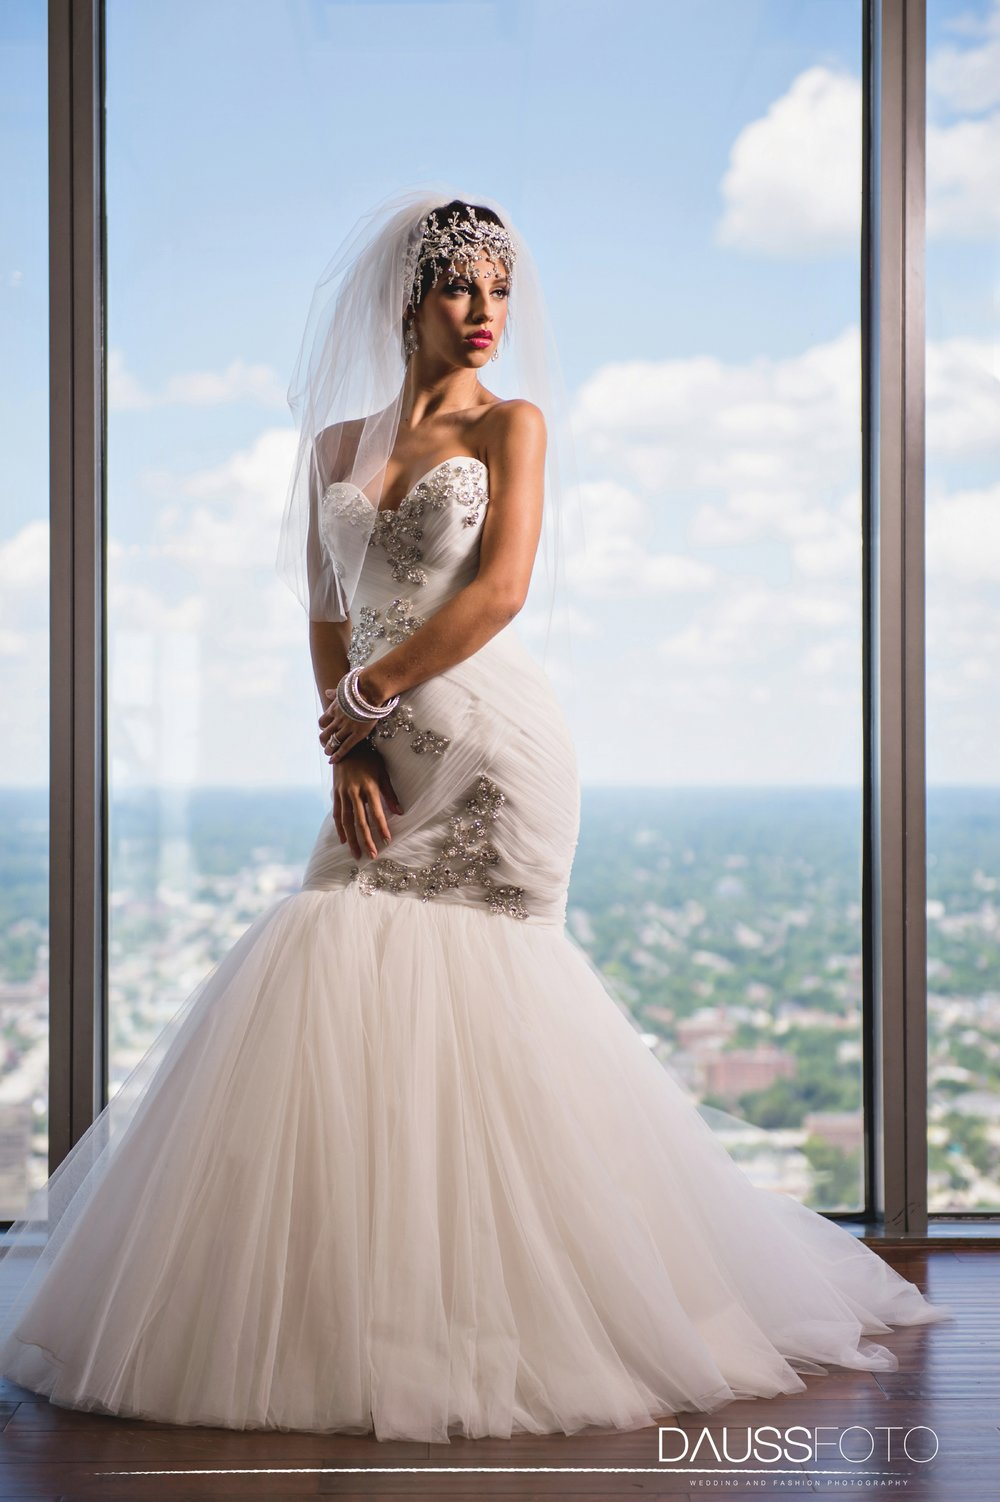 DaussFOTO_20150721_022_Indiana Wedding Photographer.jpg